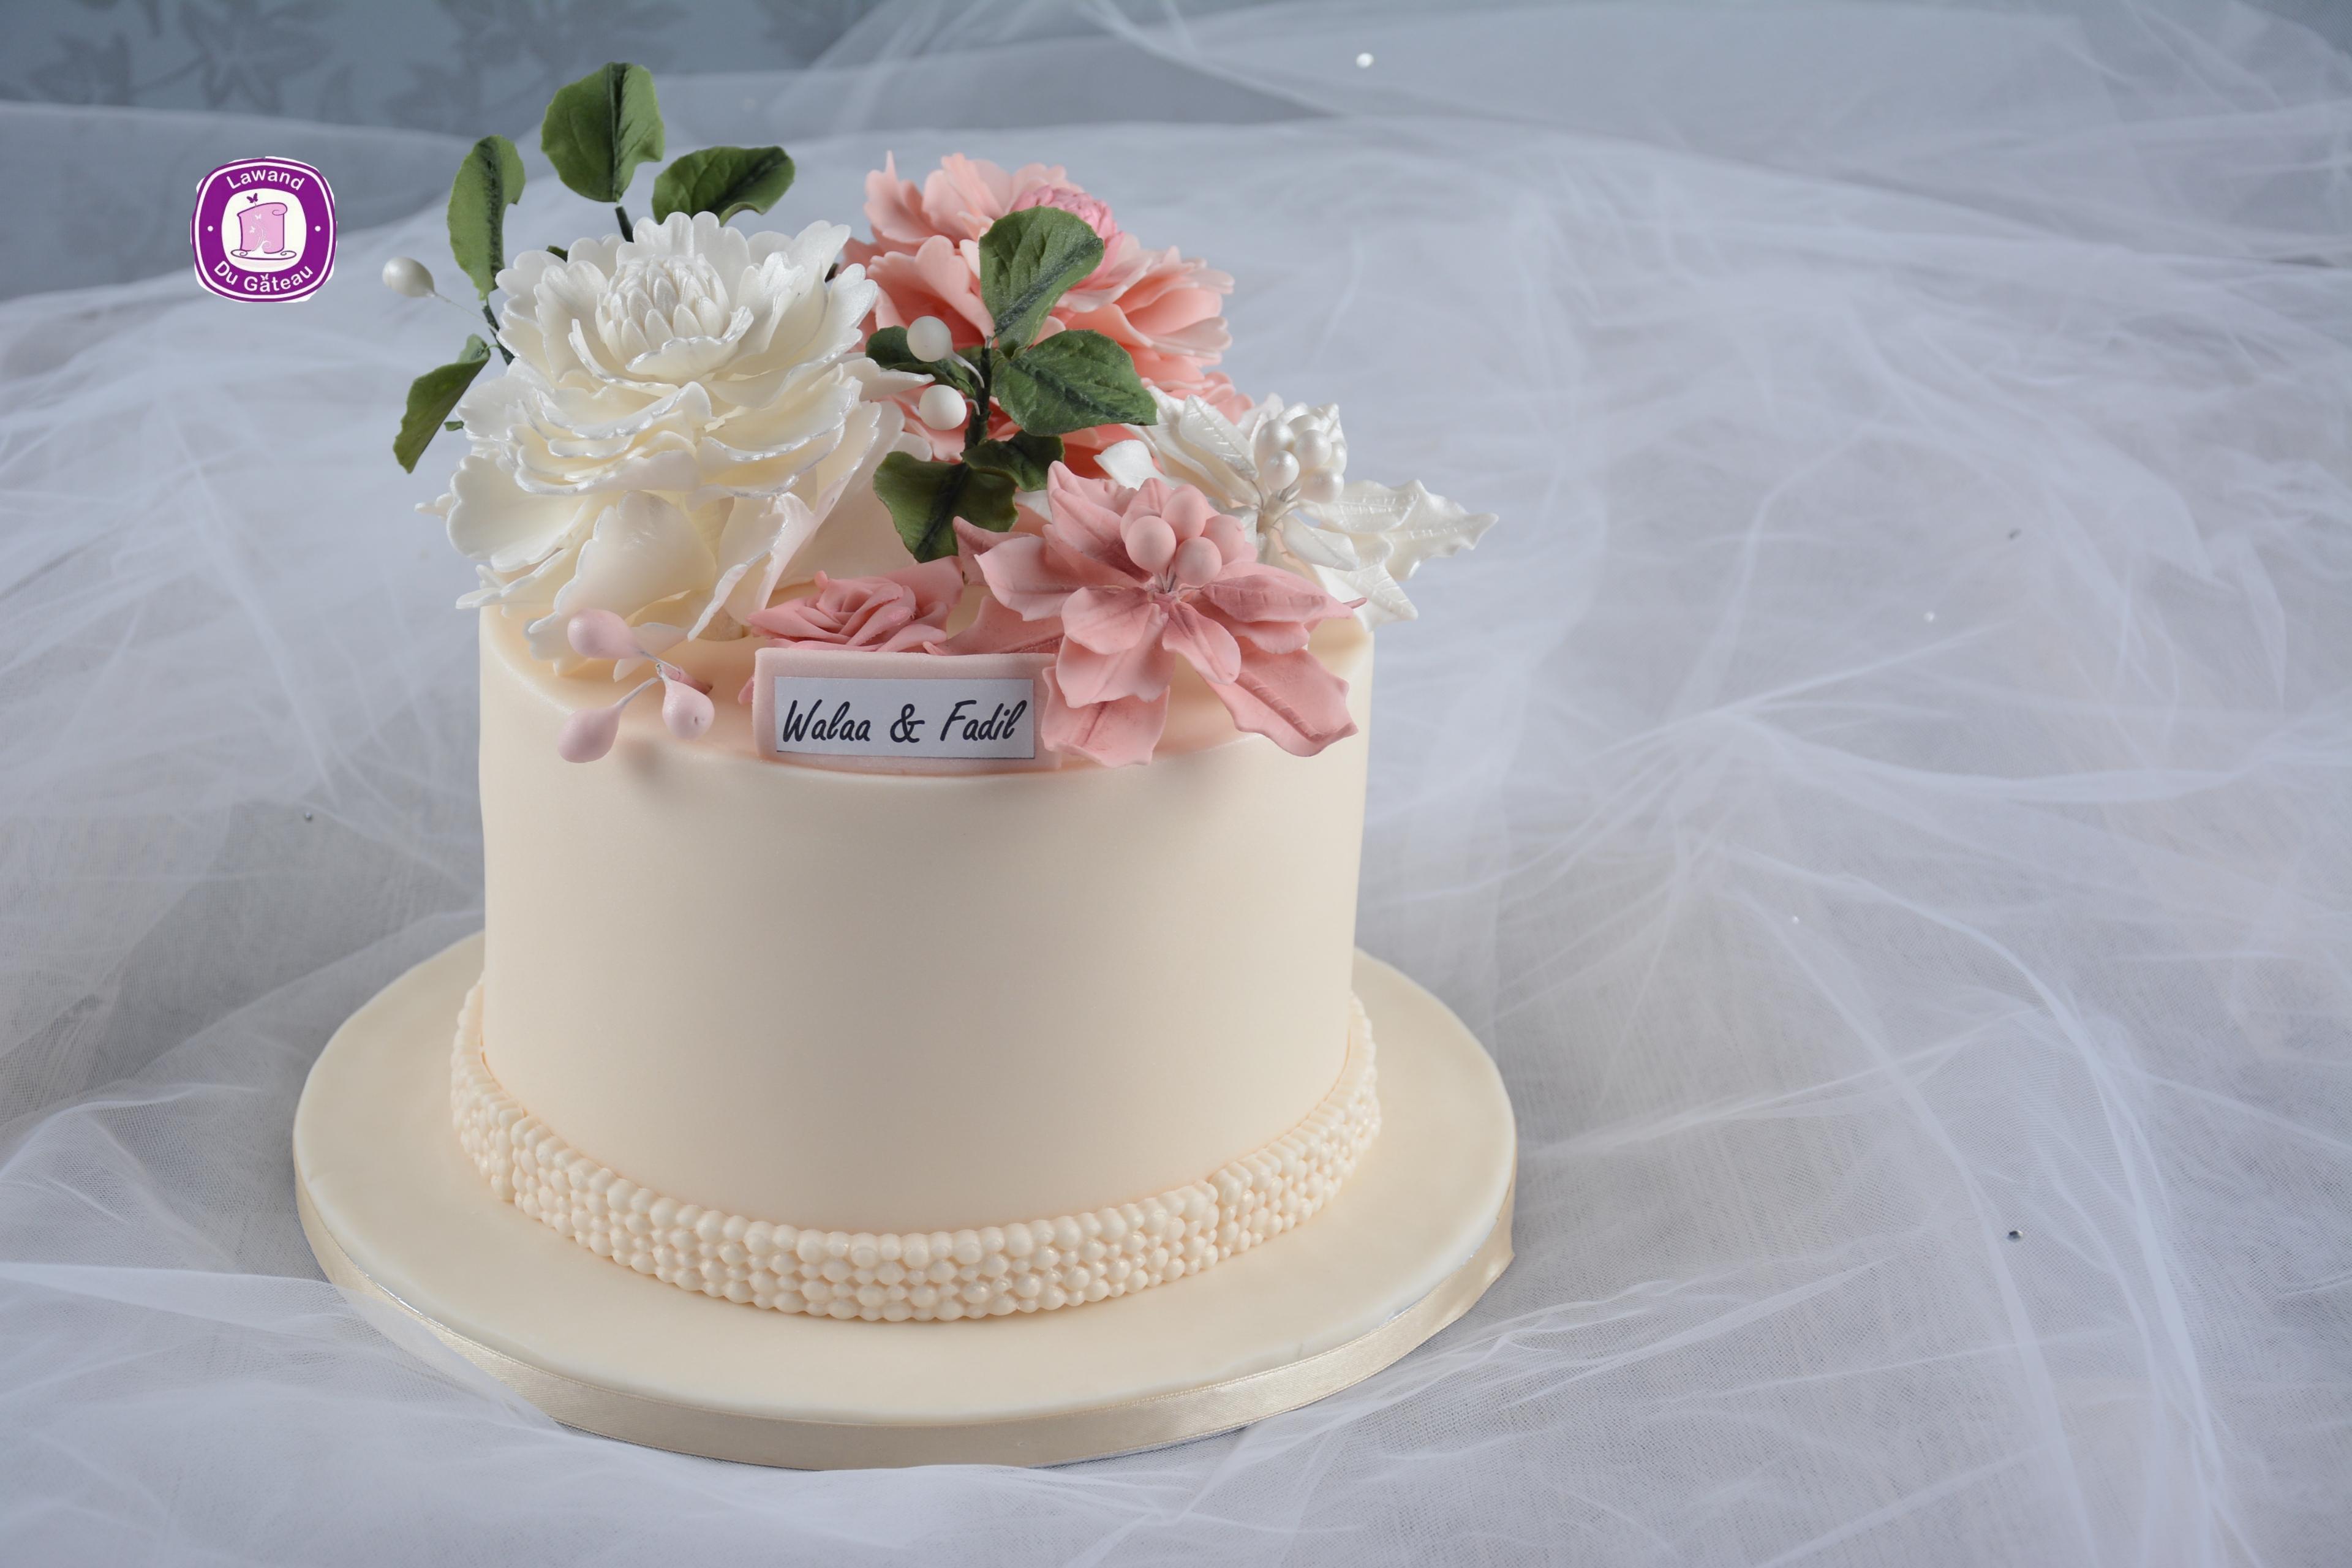 Mini ivory wedding cake with sugar flowers